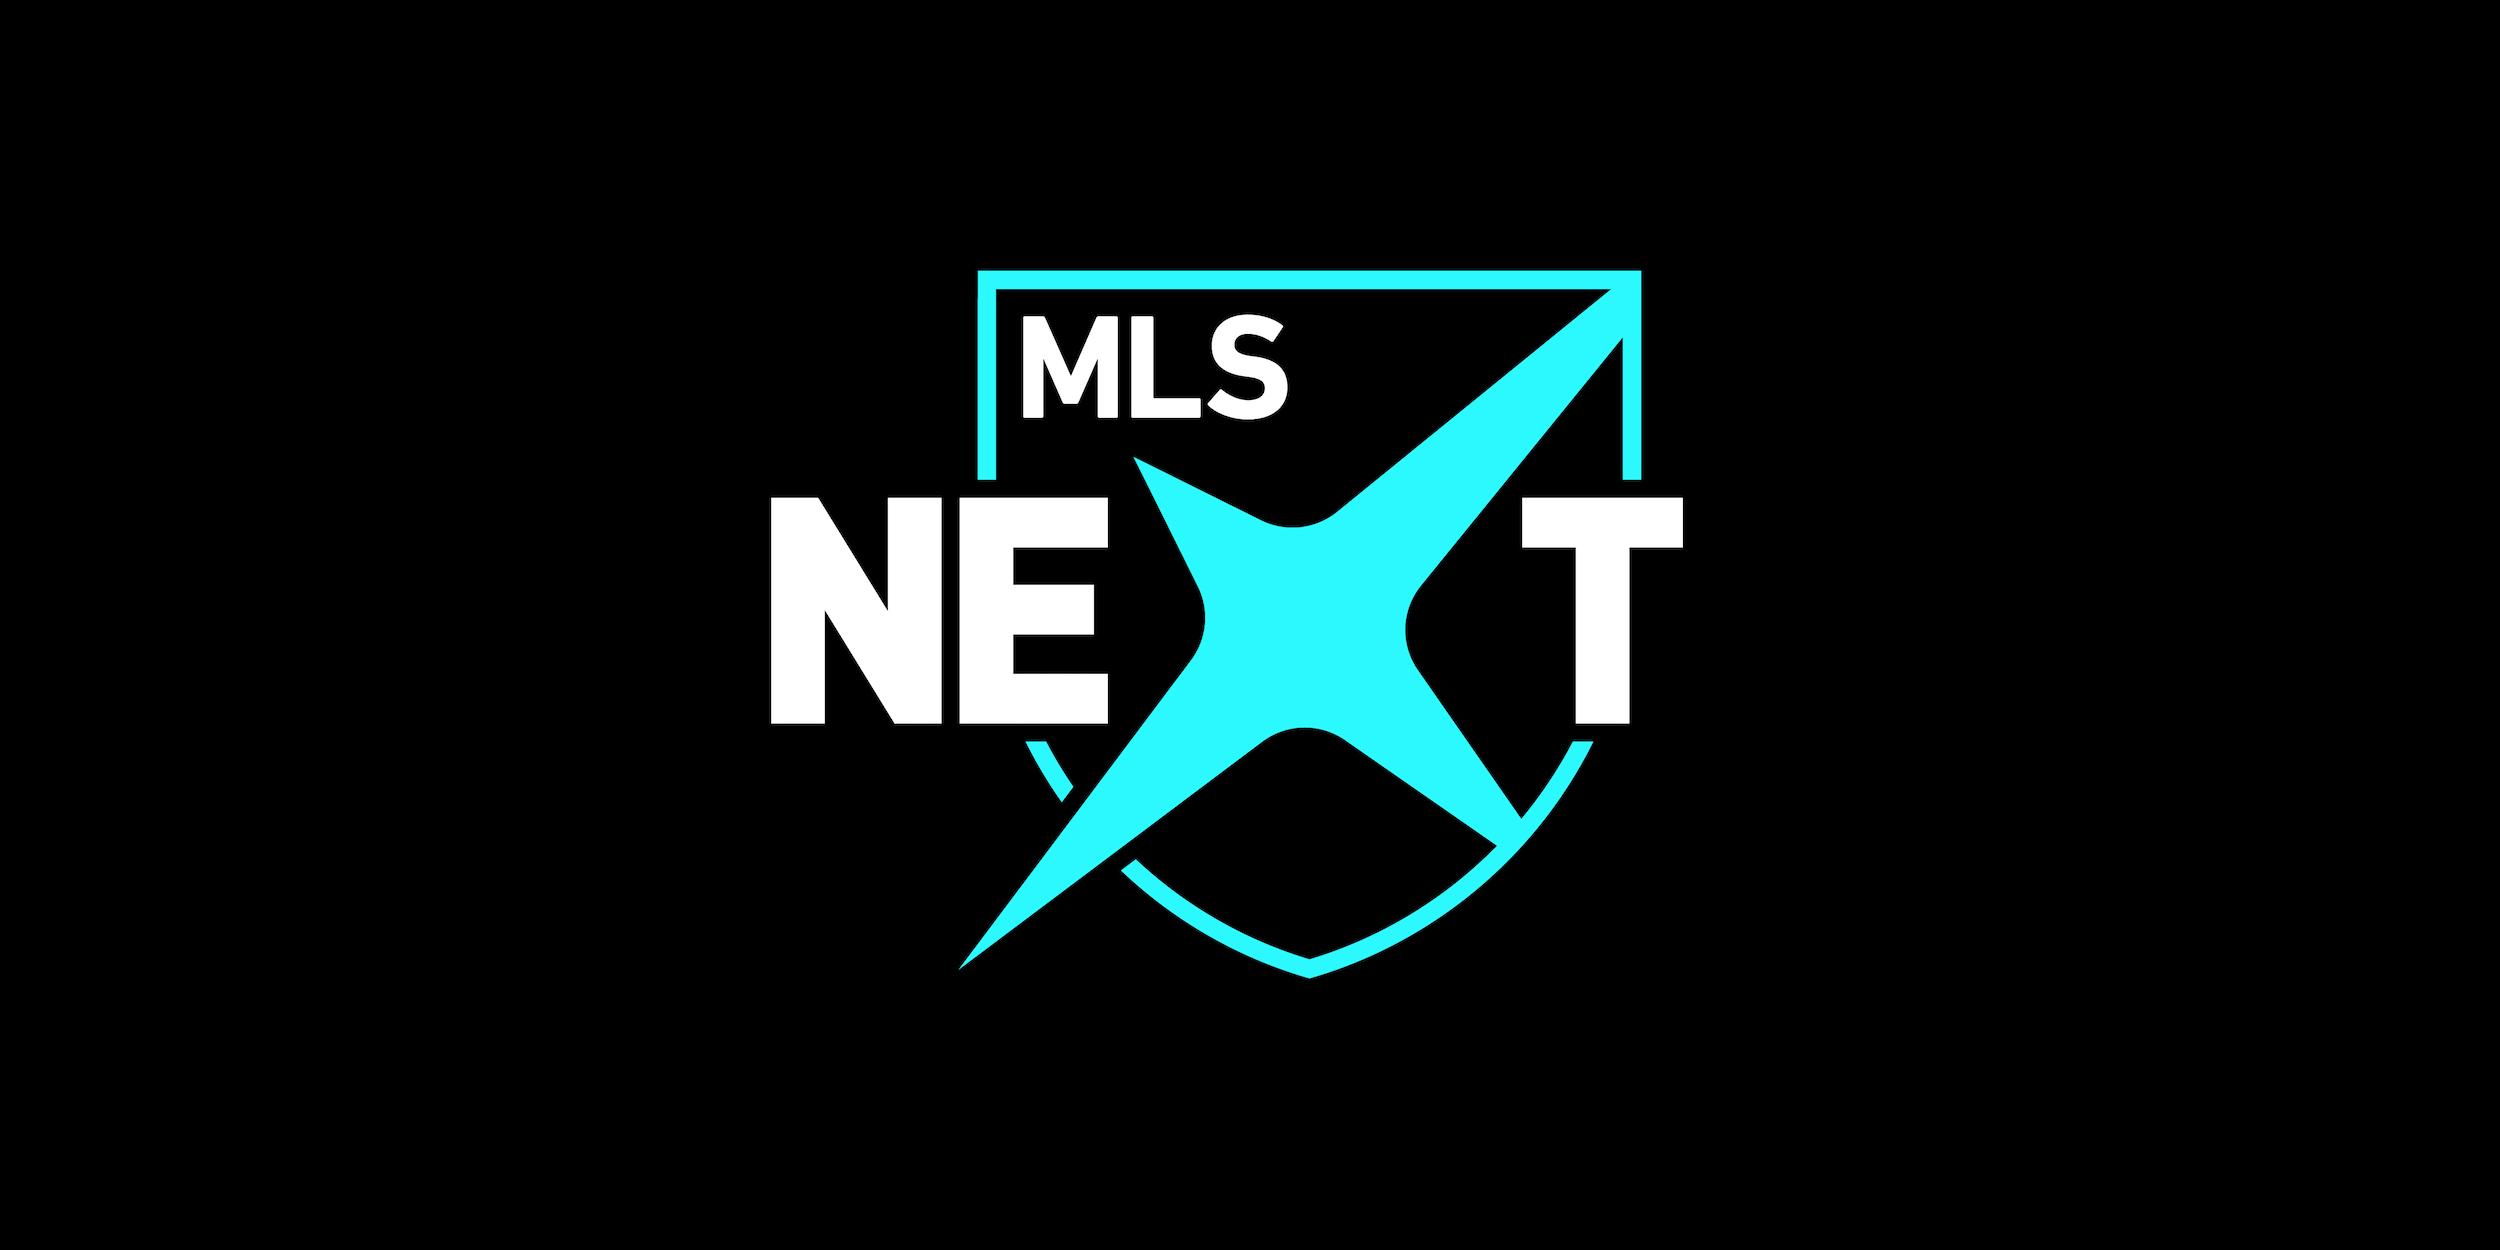 BUSC Joins MLS Next